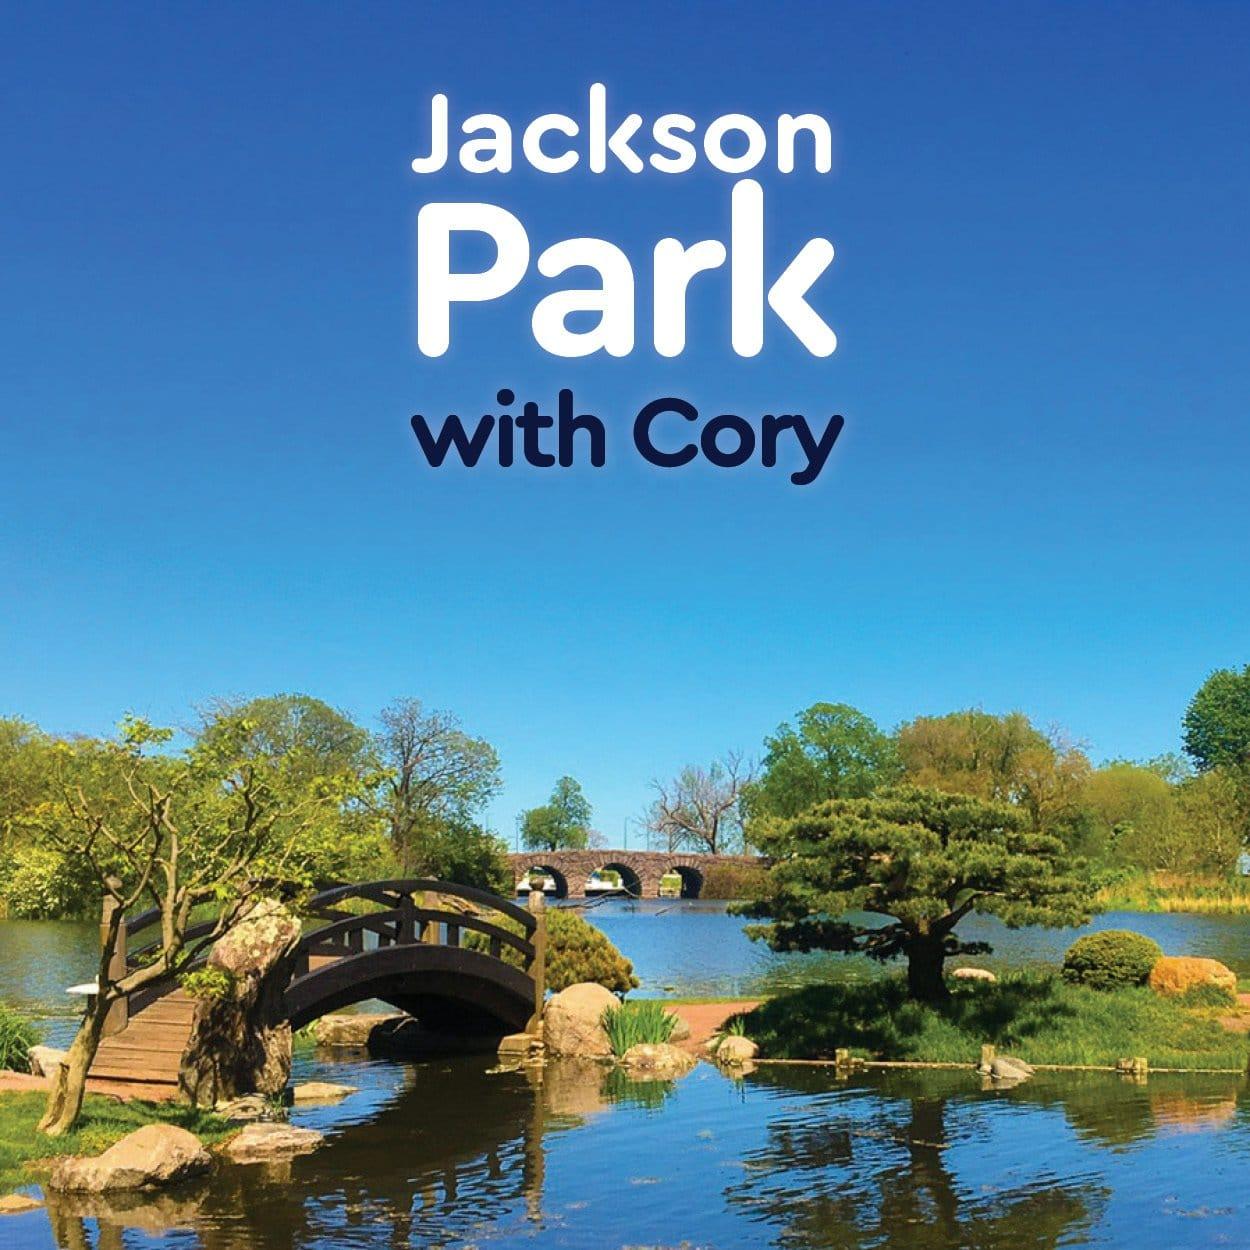 Cory at Jackson Park